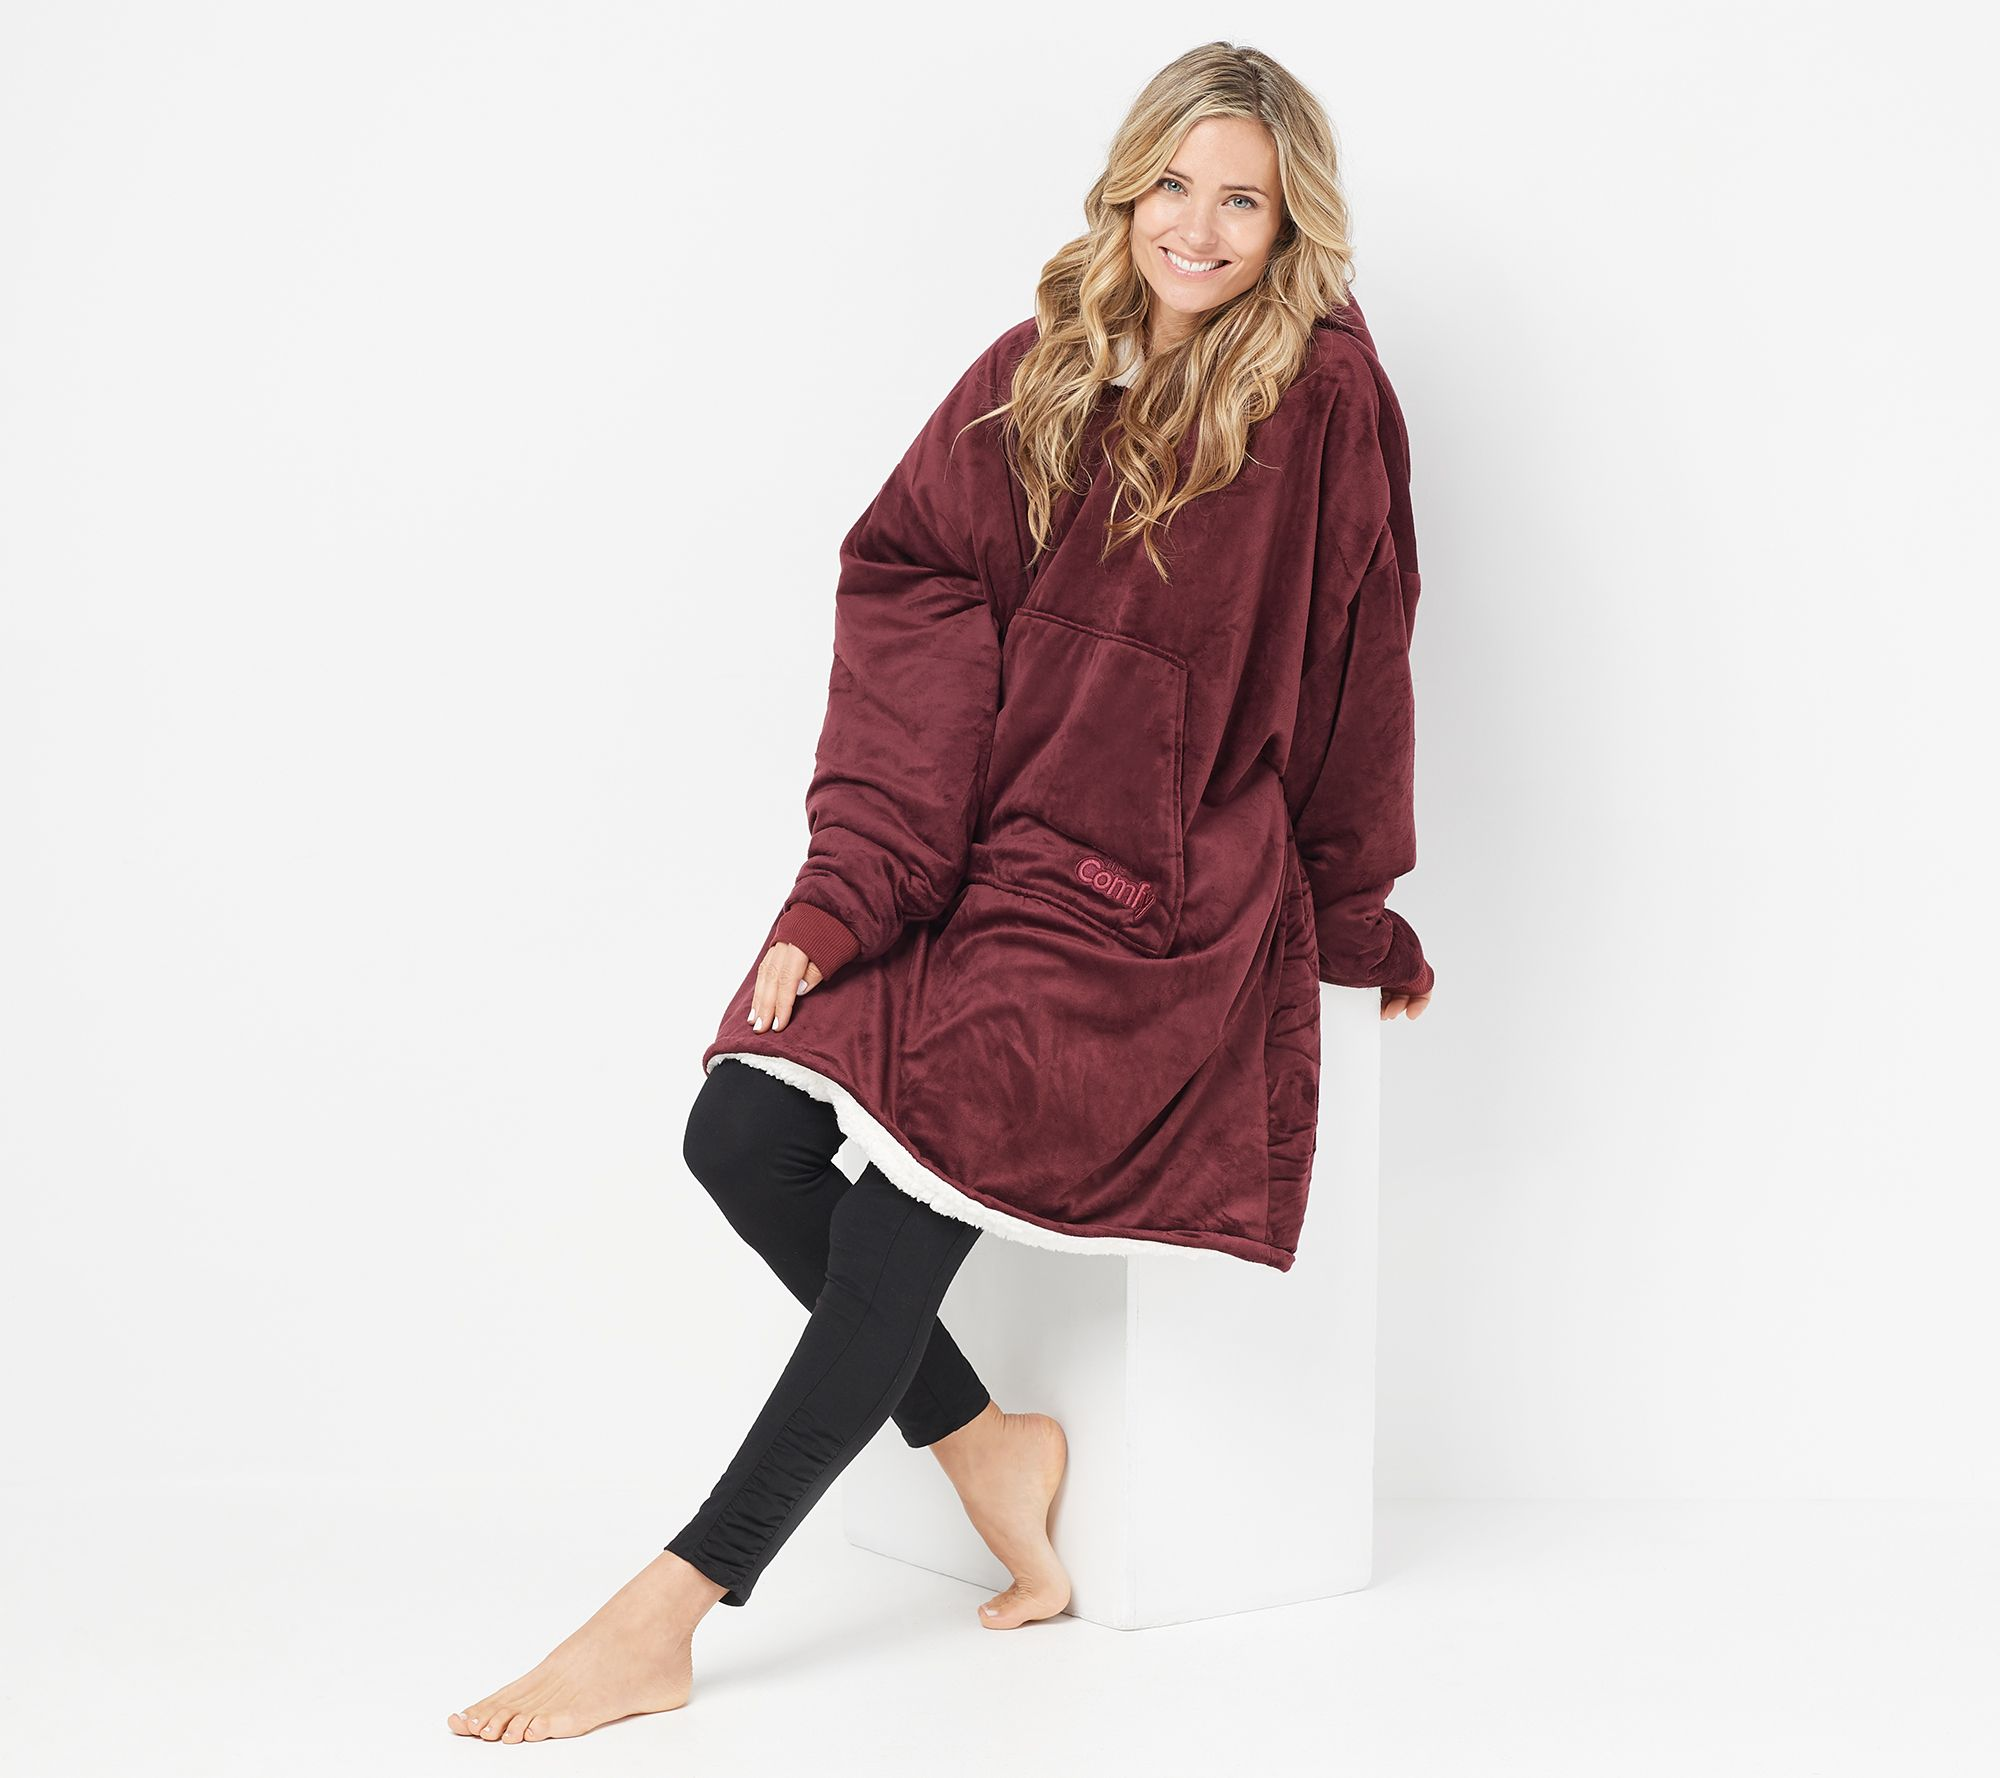 The Comfy Original Oversized Blanket Sweatshirt - Page 1 — QVC.com abda95e26